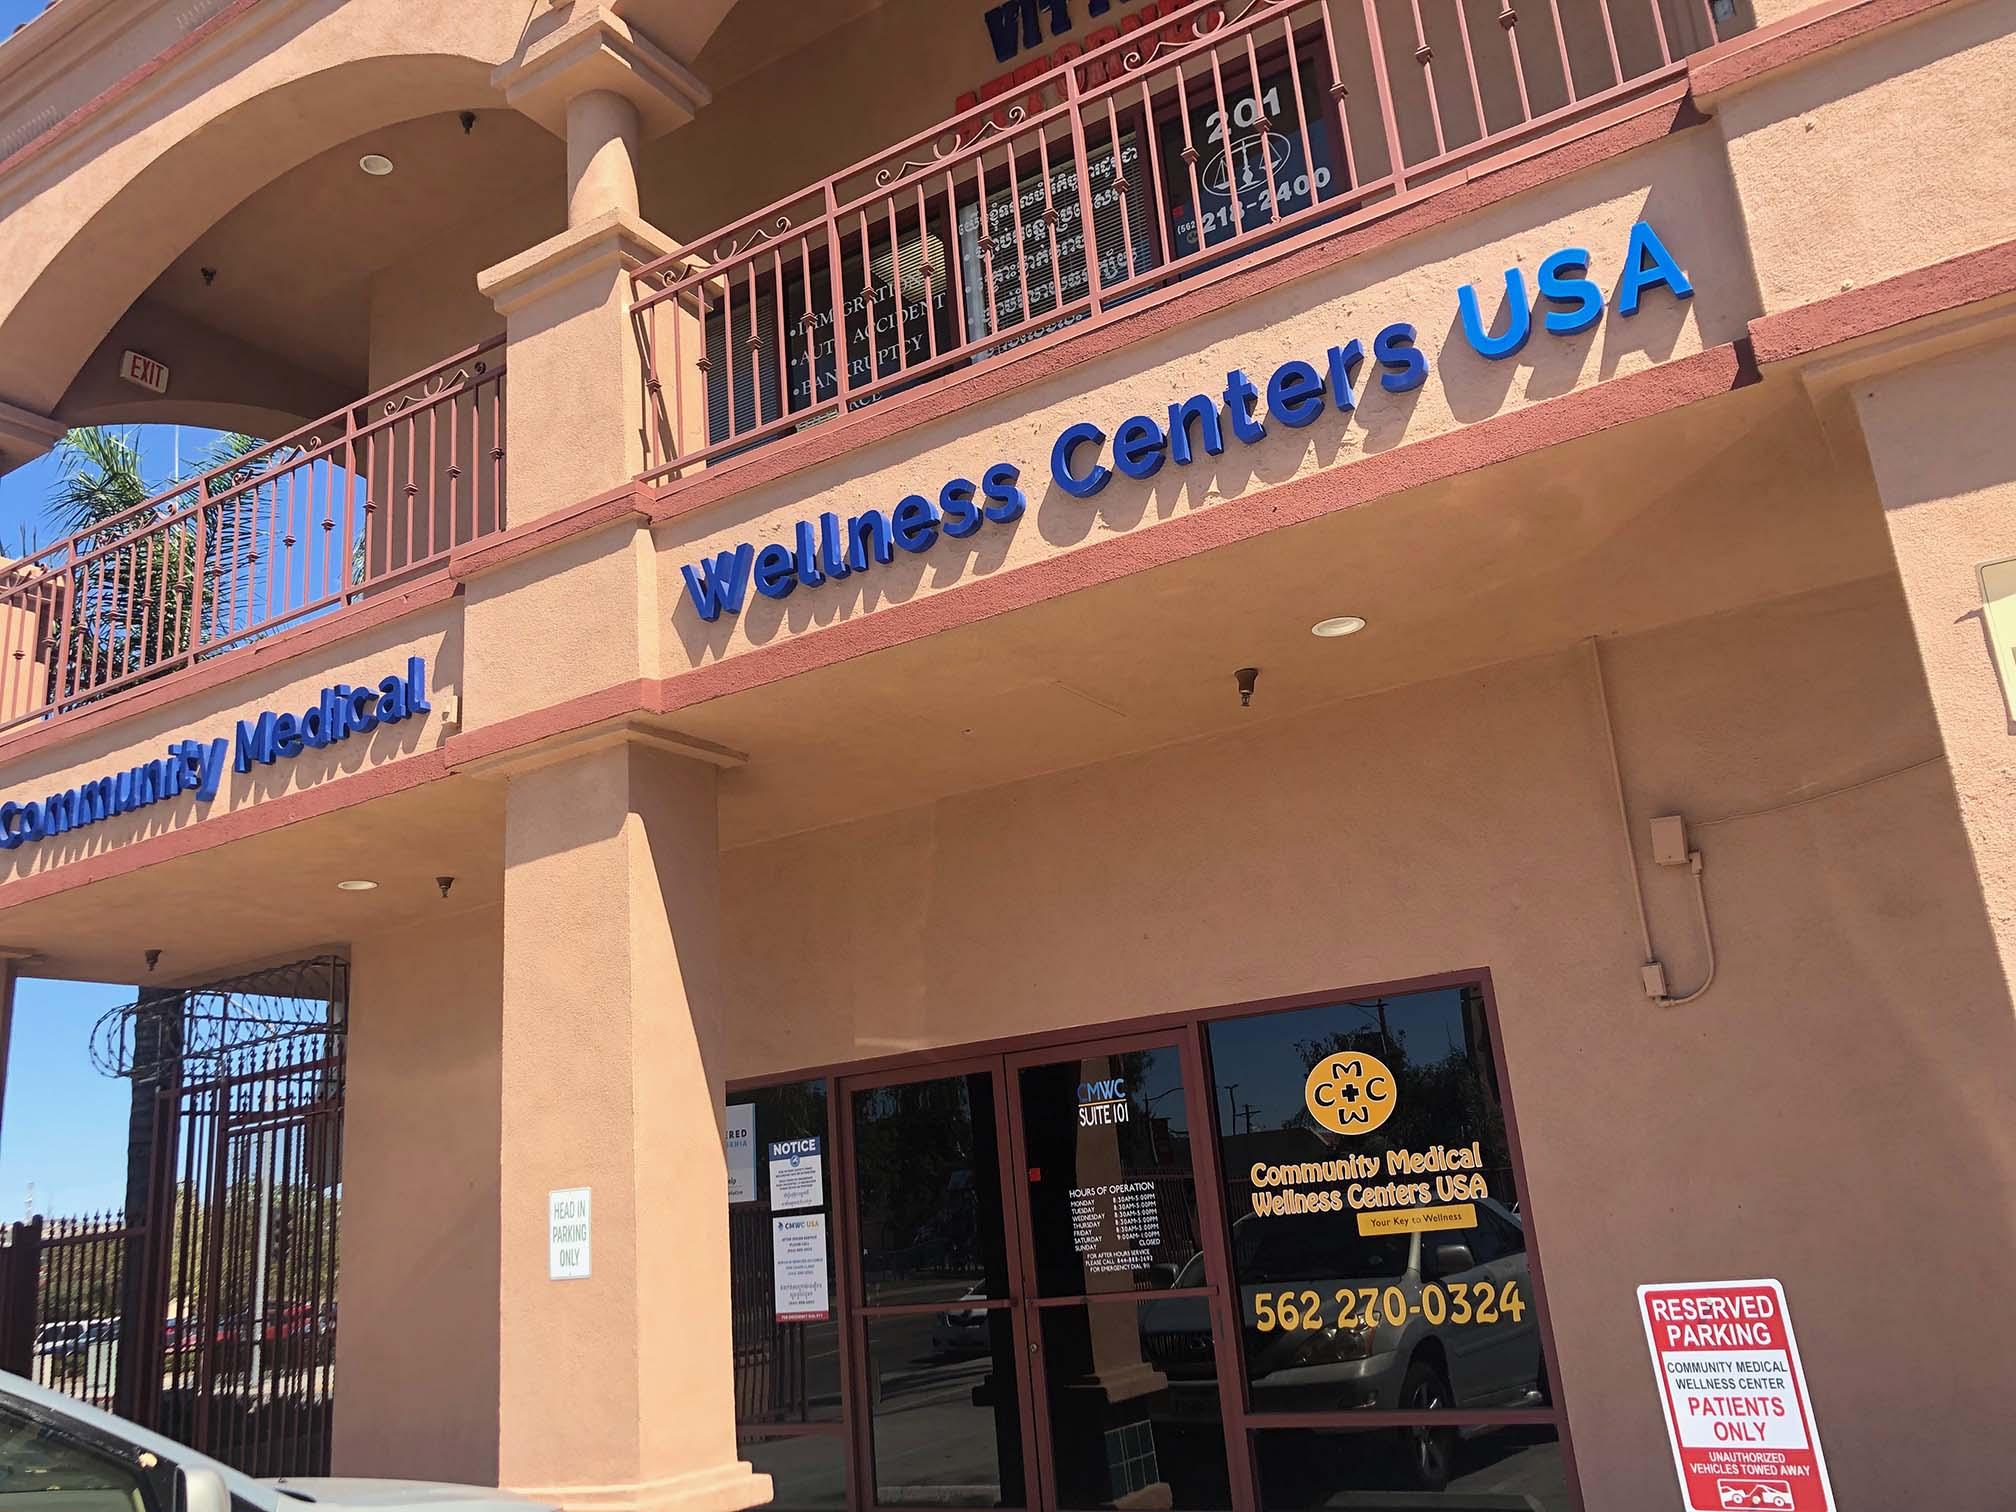 Community Medical Wellness Centers, USA